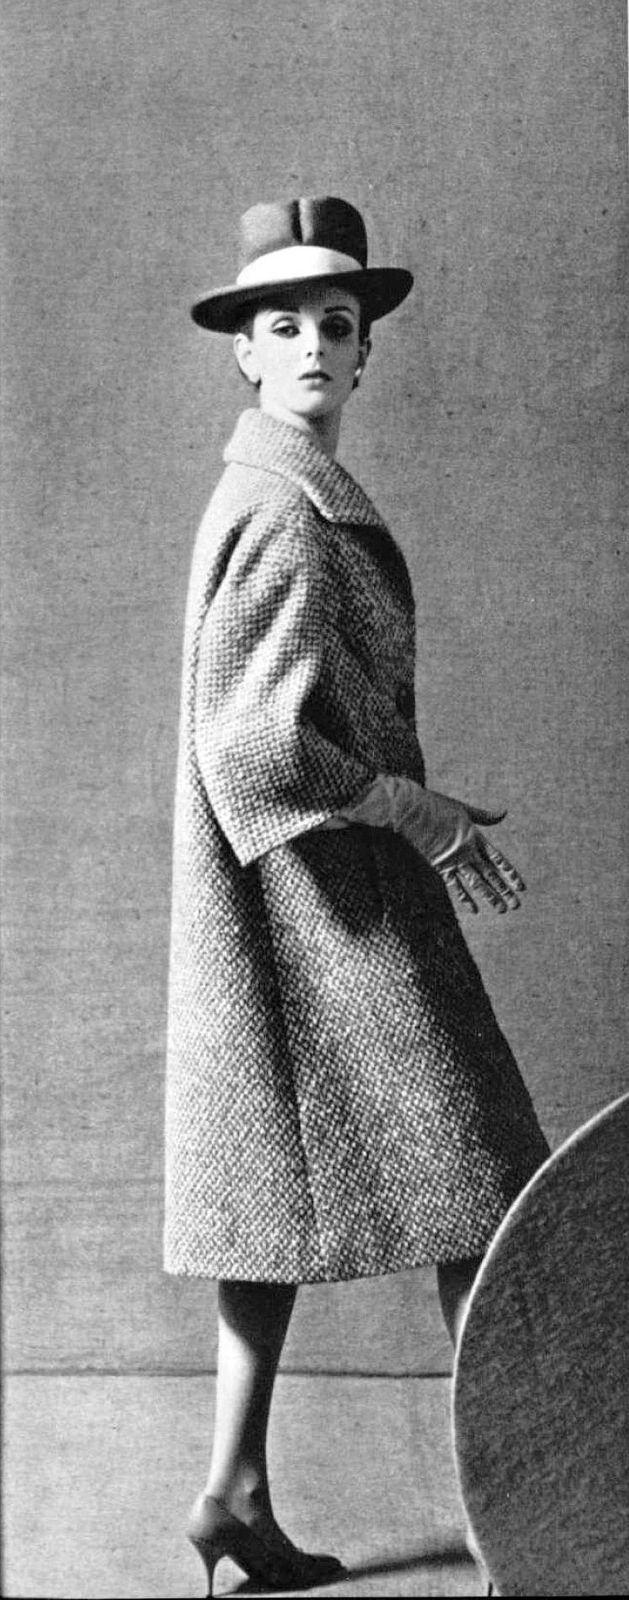 Grace Coddington in tweed coat by Pierre Balmain, photo by Guy Arsac, 1963